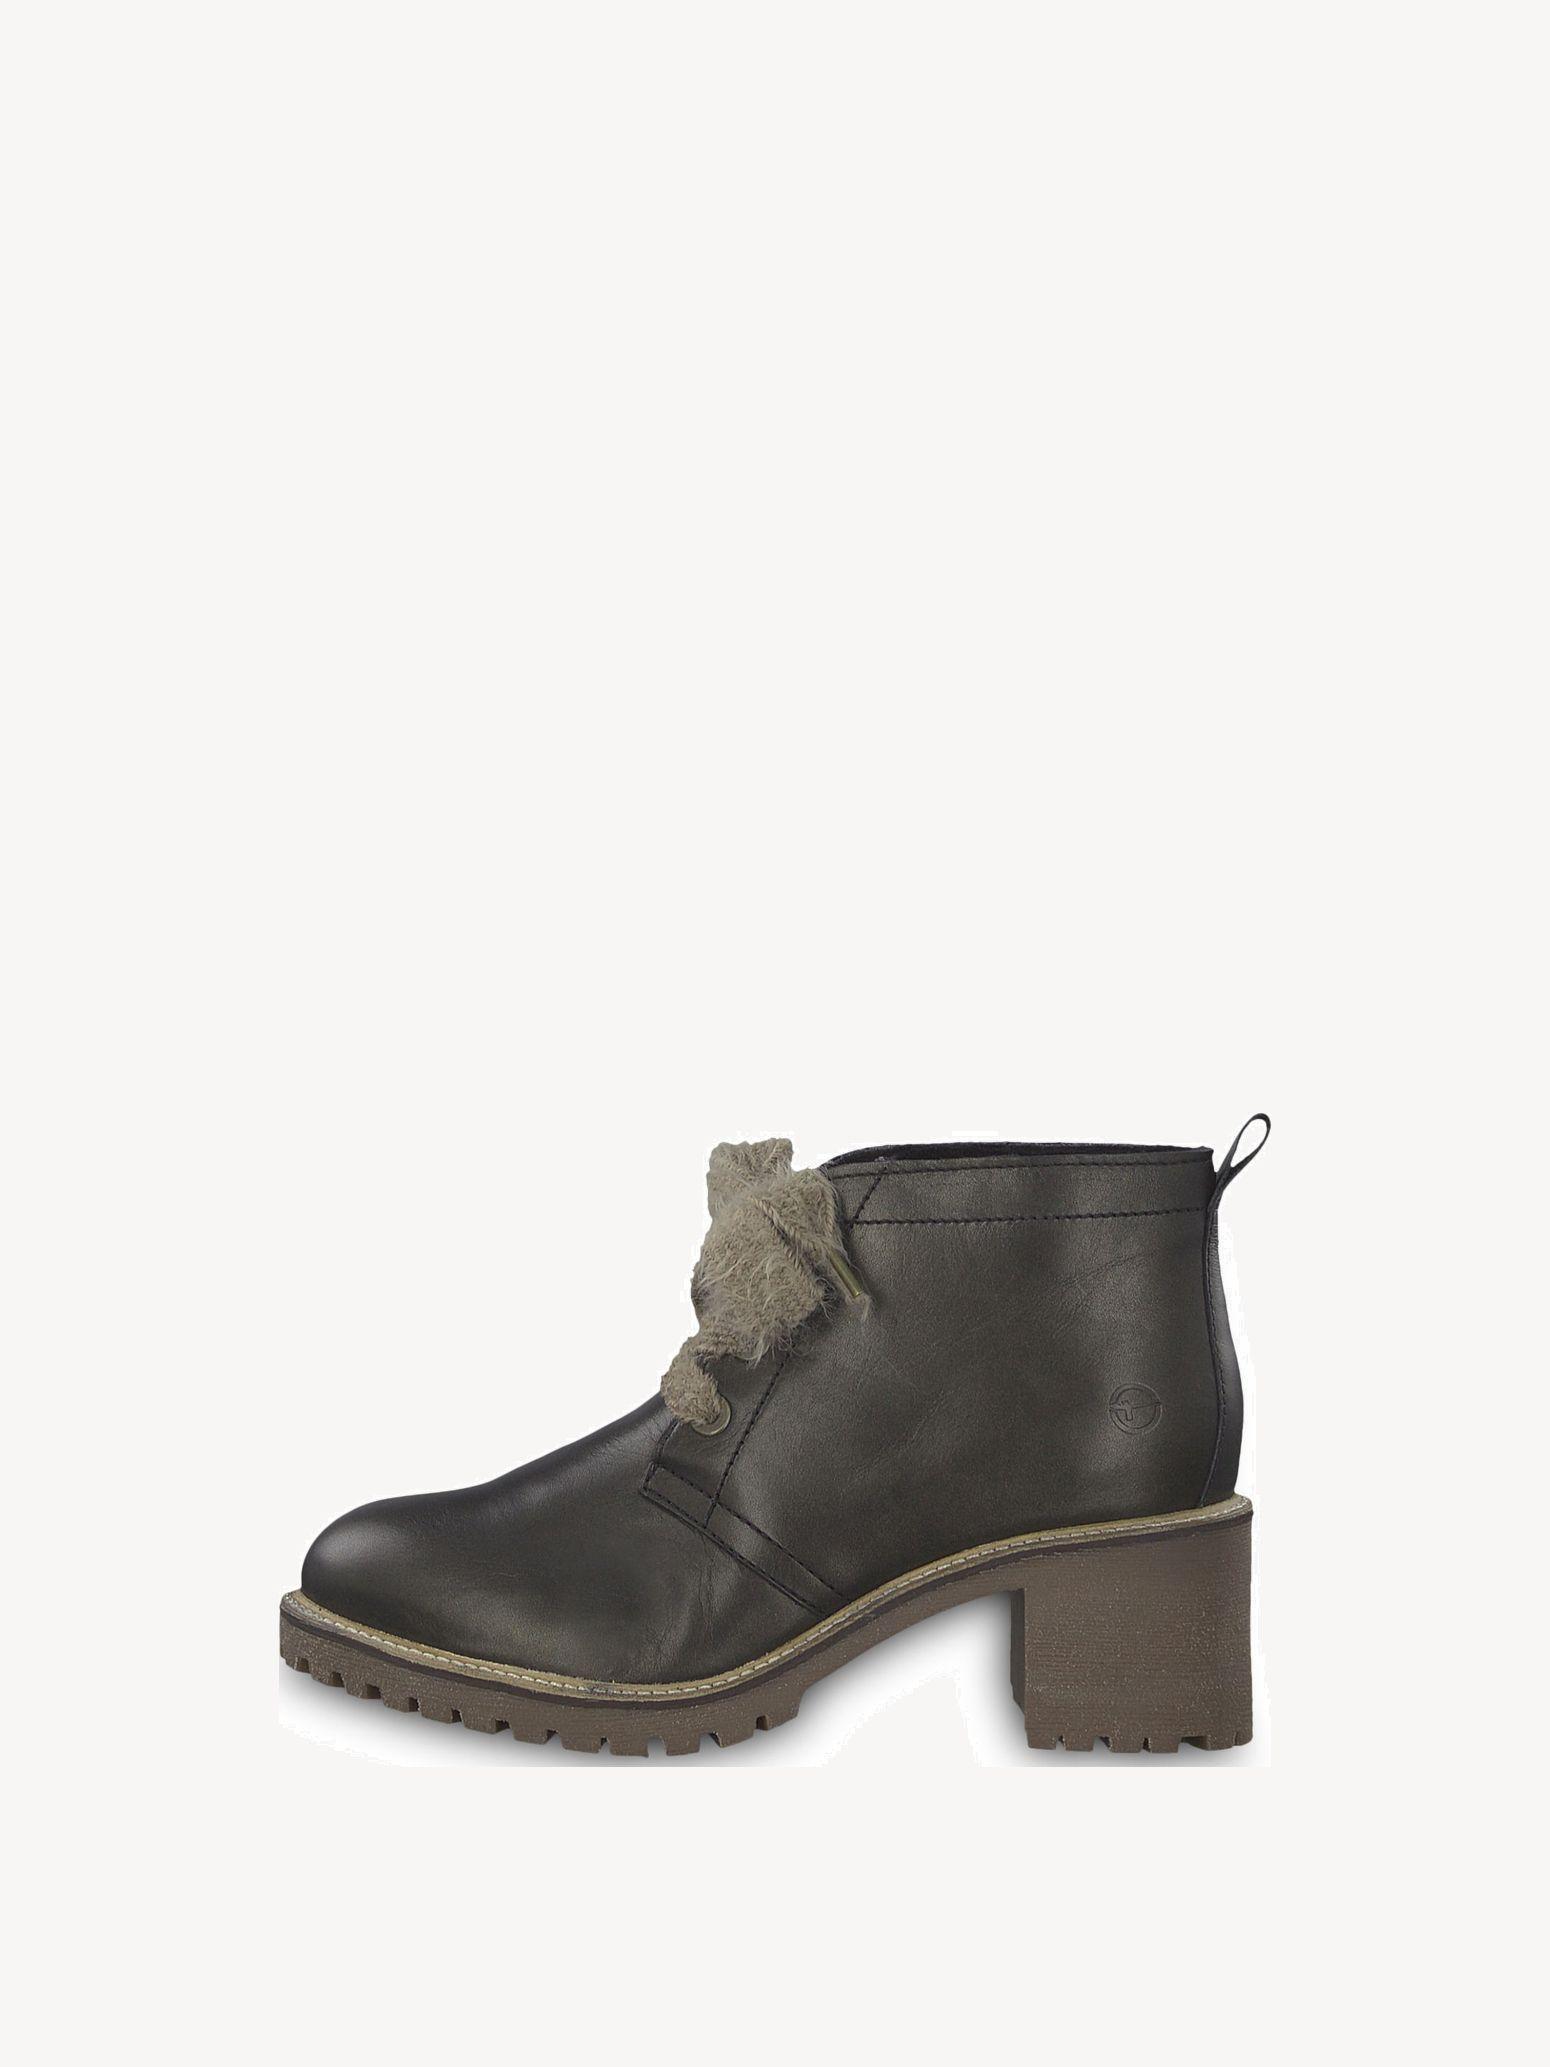 Tamaris Irina Stiefelette cognac | Schuhe